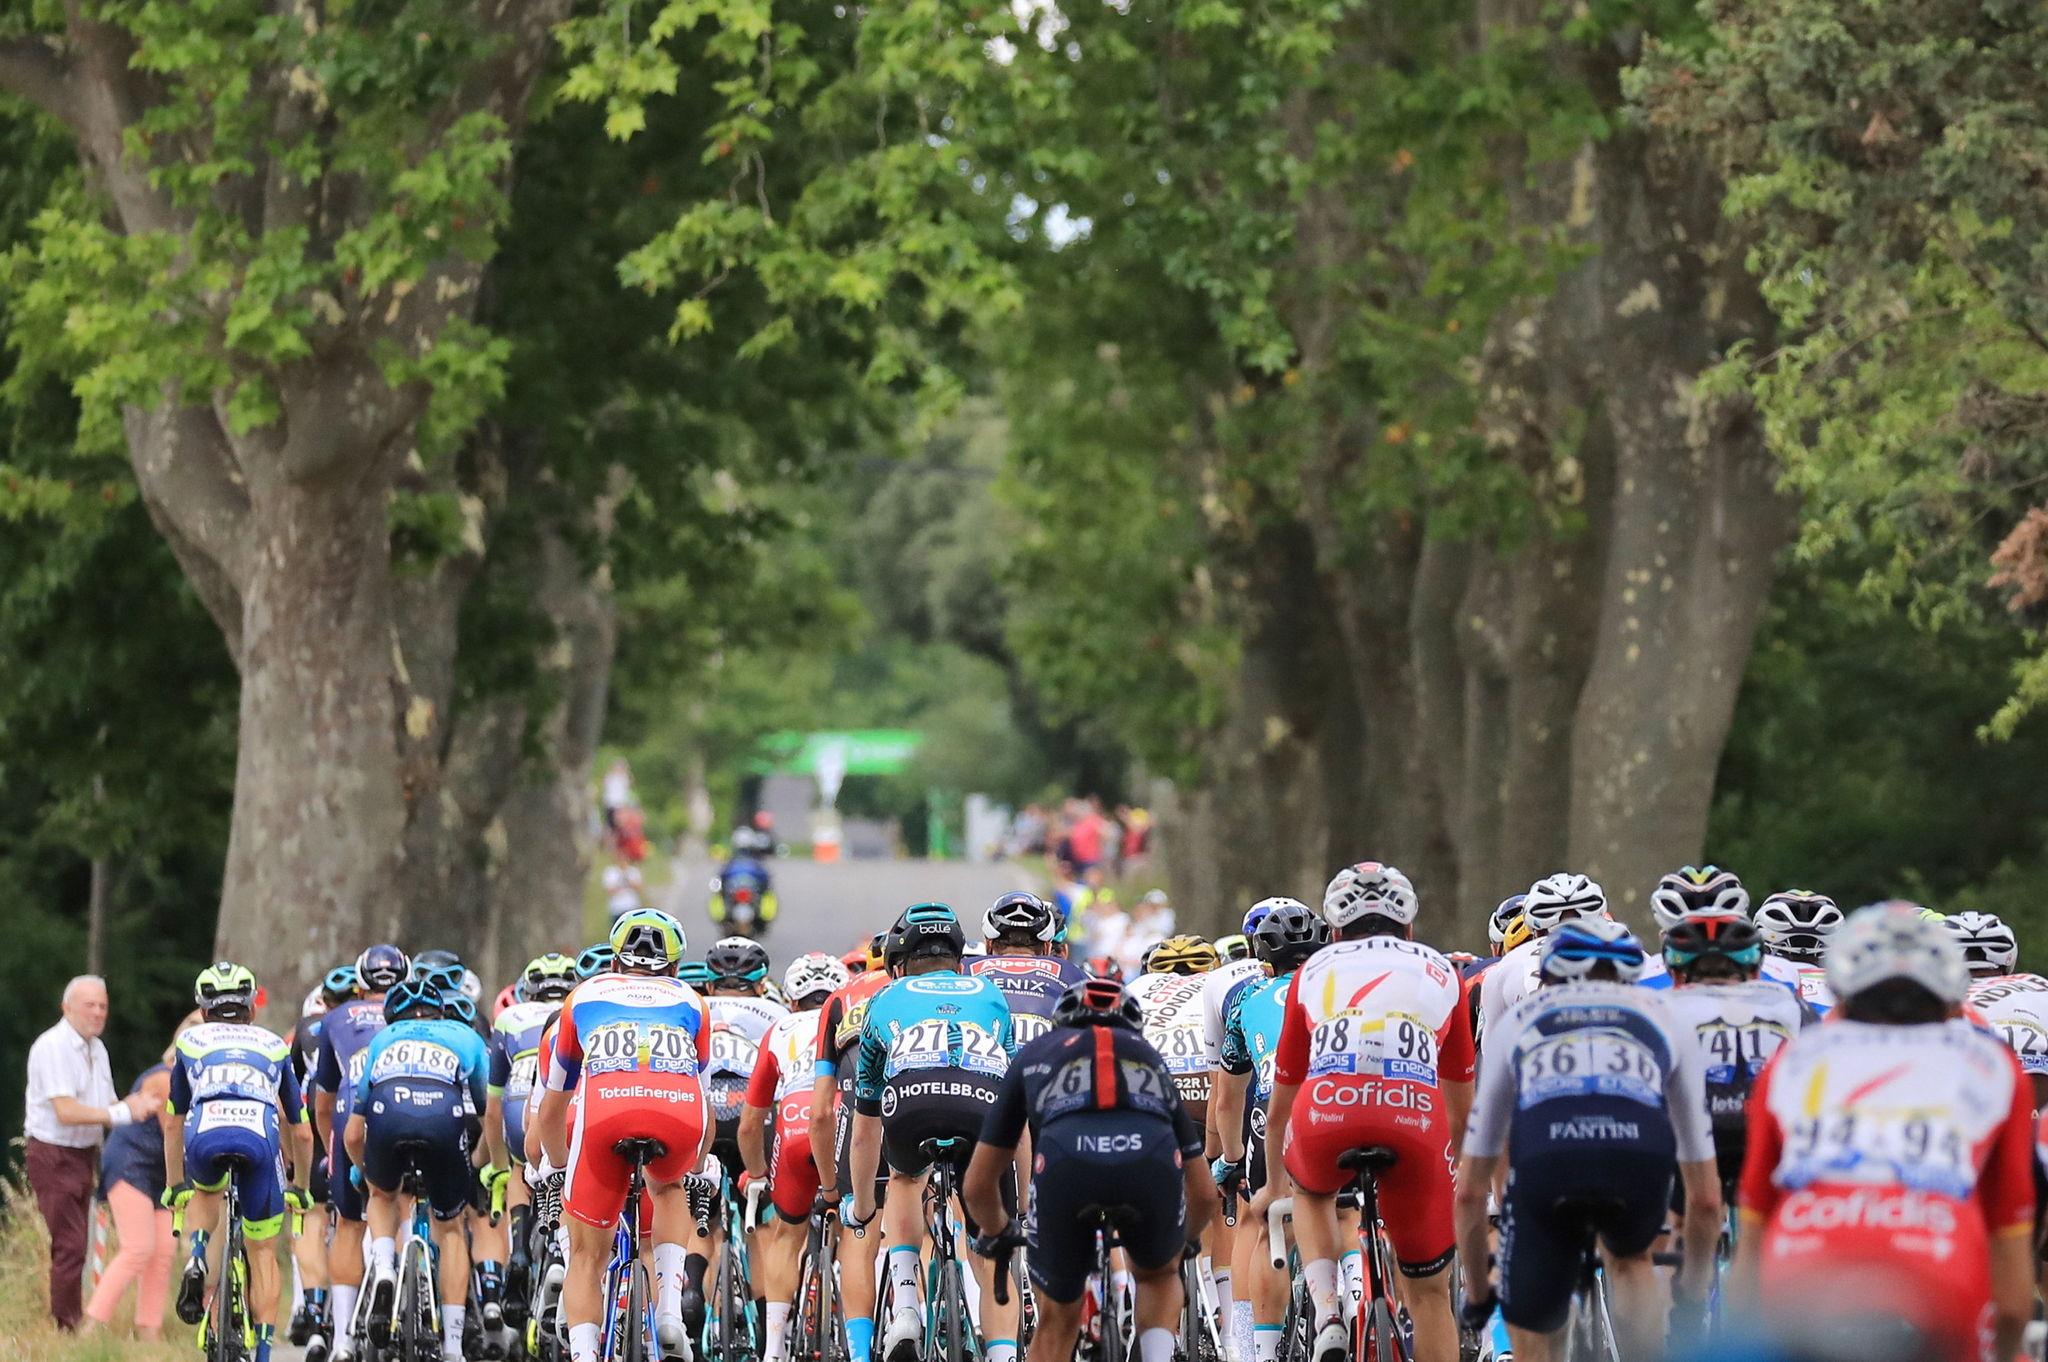 El pelotón rueda durante la 12ª etapa del Tour.